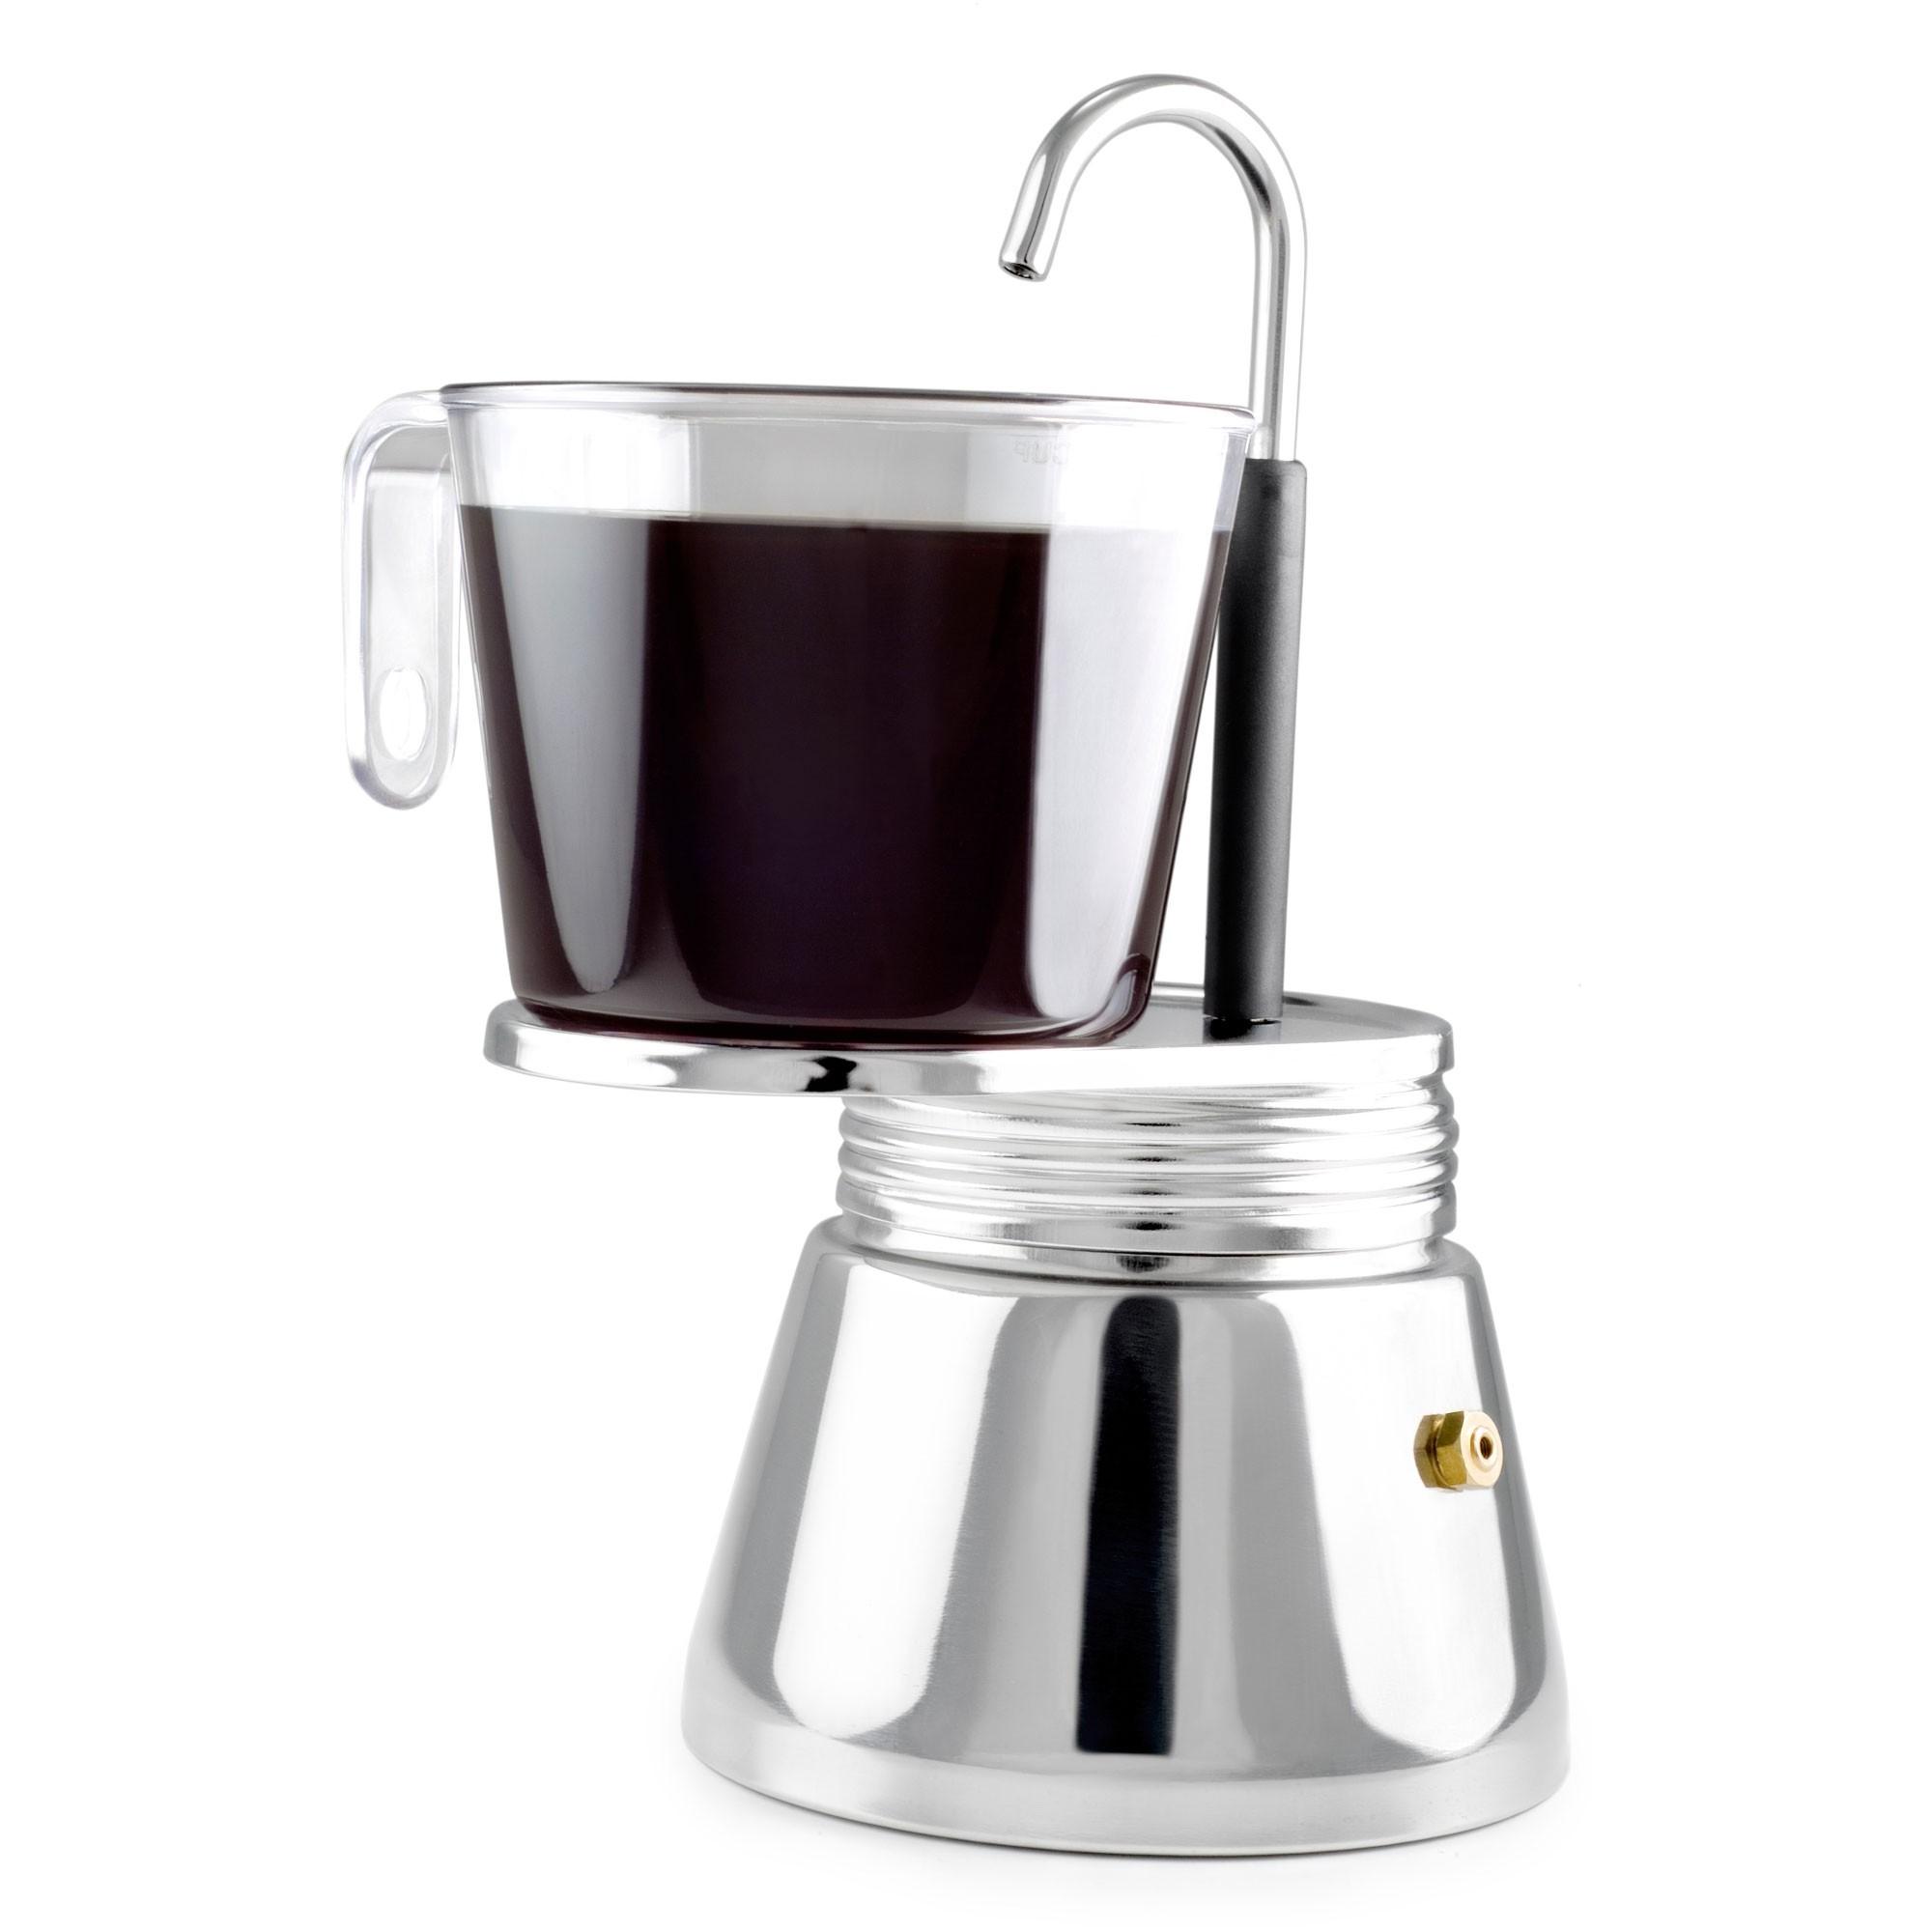 GSI-Glacier-Stainless-4-Cup-Mini-Espresso-3-g-2000px-S16